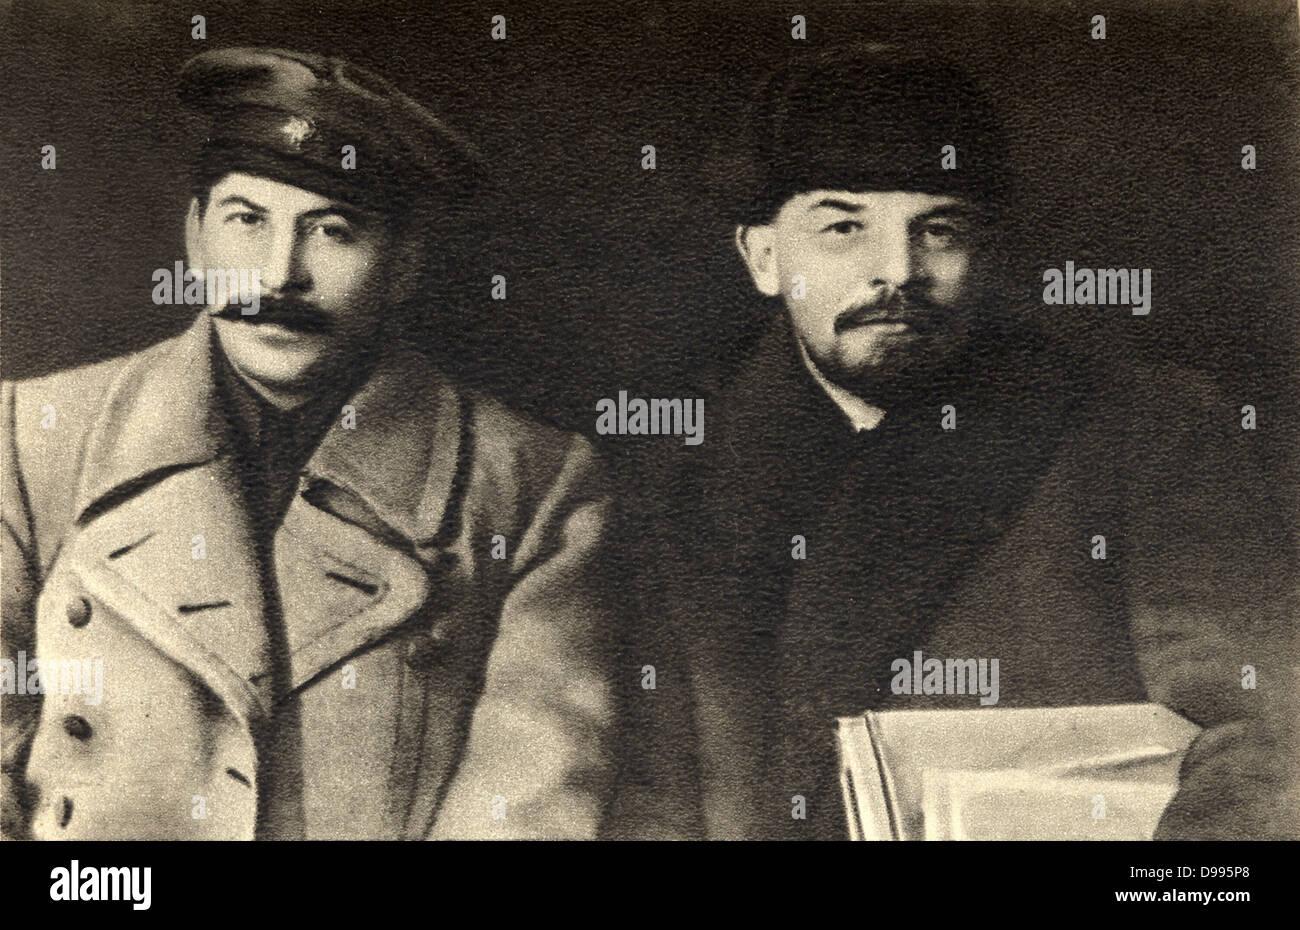 Vladimir Lenin and Joseph Stalin together in 1919 - Stock Image